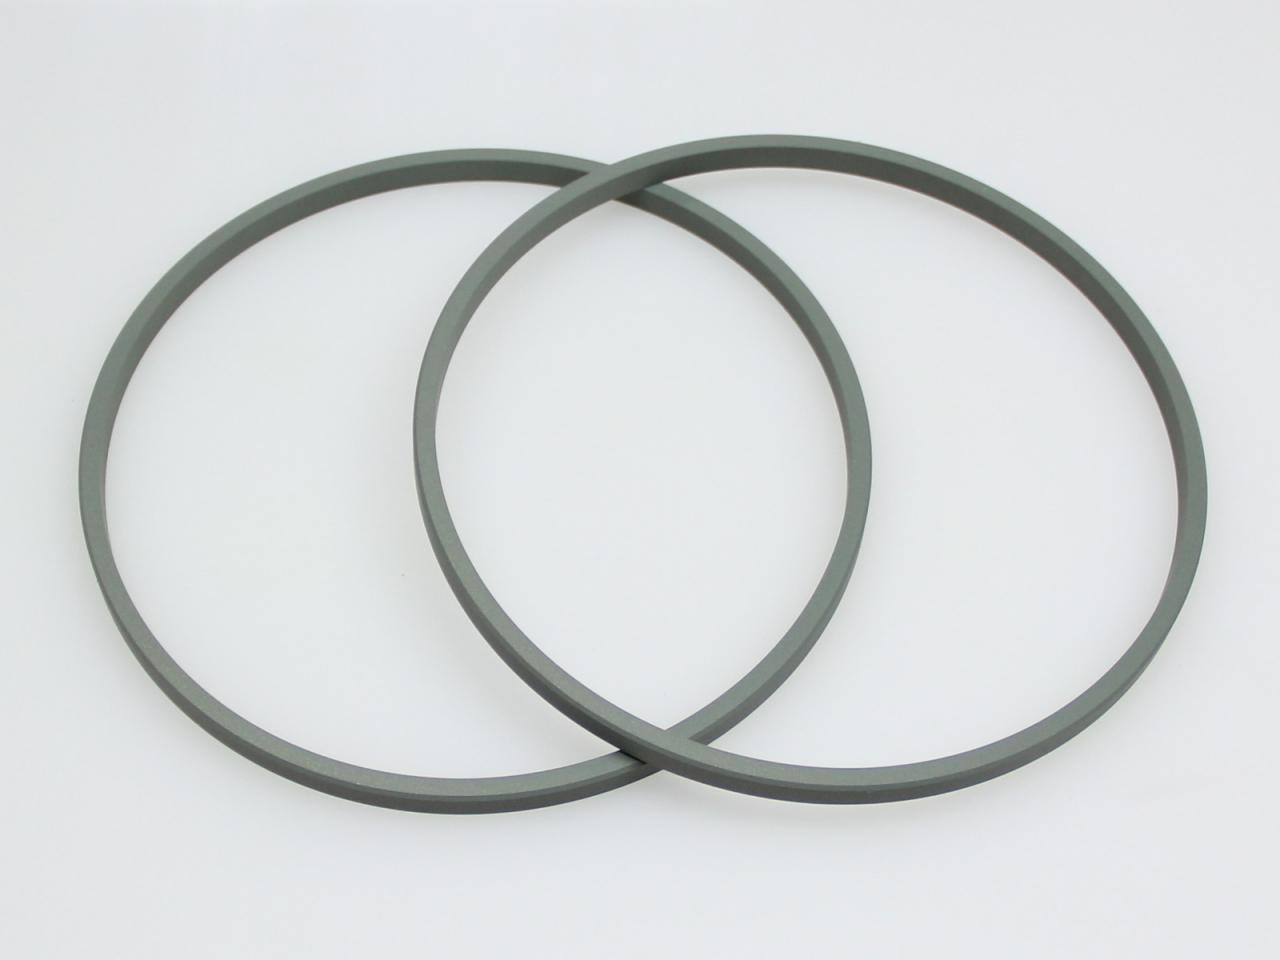 DSH-Piston Seal Design | Piston Seal Bronze Filled PTFE Glyd Ring-2